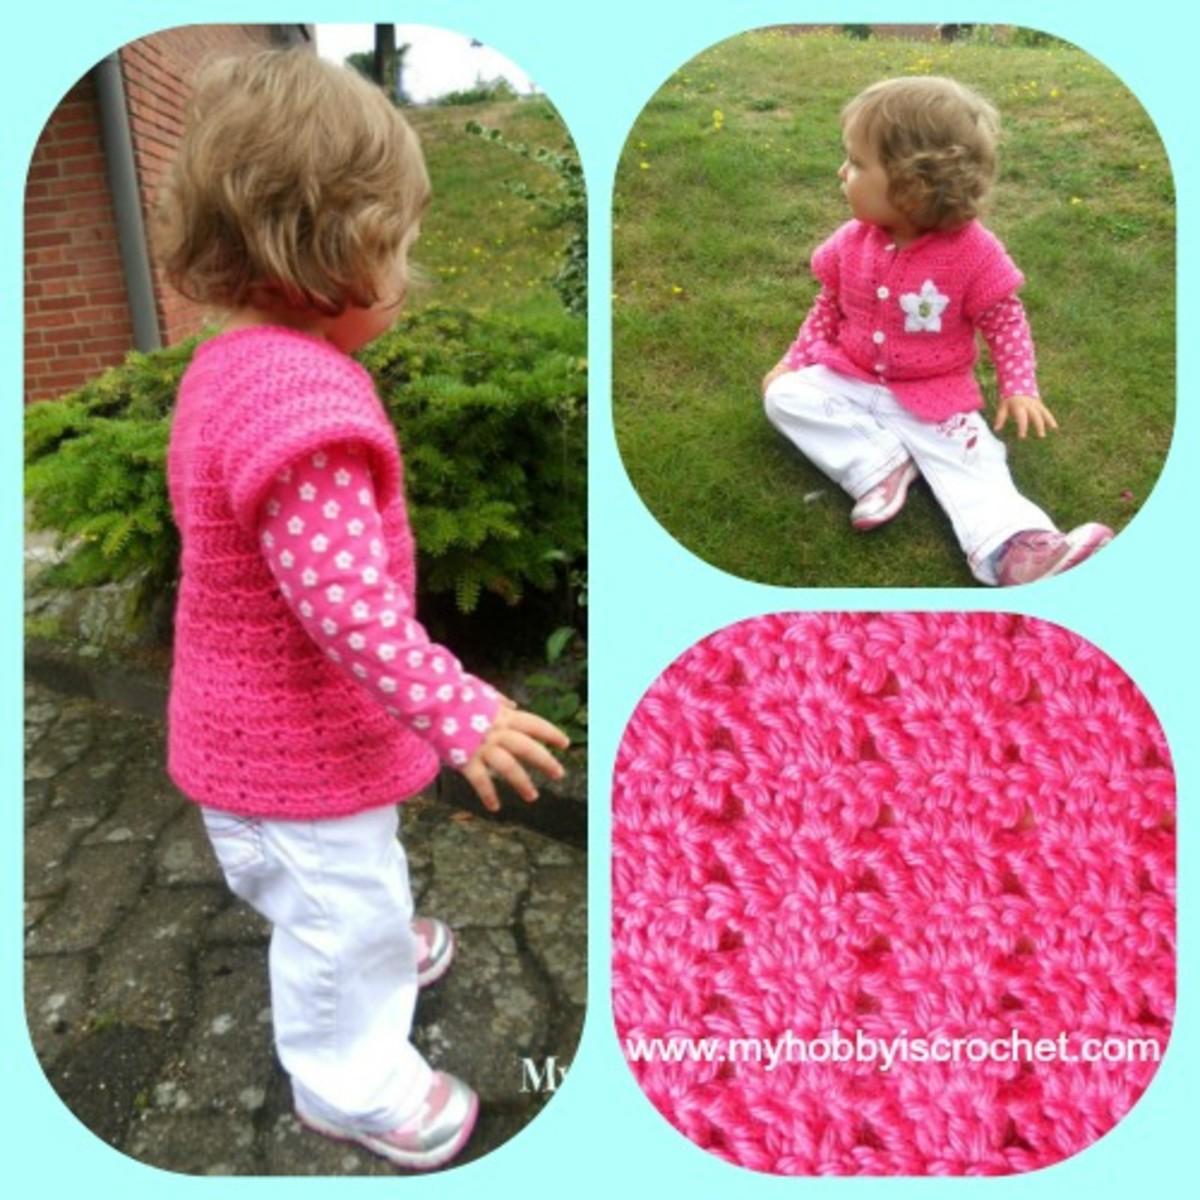 Little Girl's Cardigan with Short Sleeves - http://www.myhobbyiscrochet.com/2013/09/little-girls-cardigan-with-short-sleeves.html